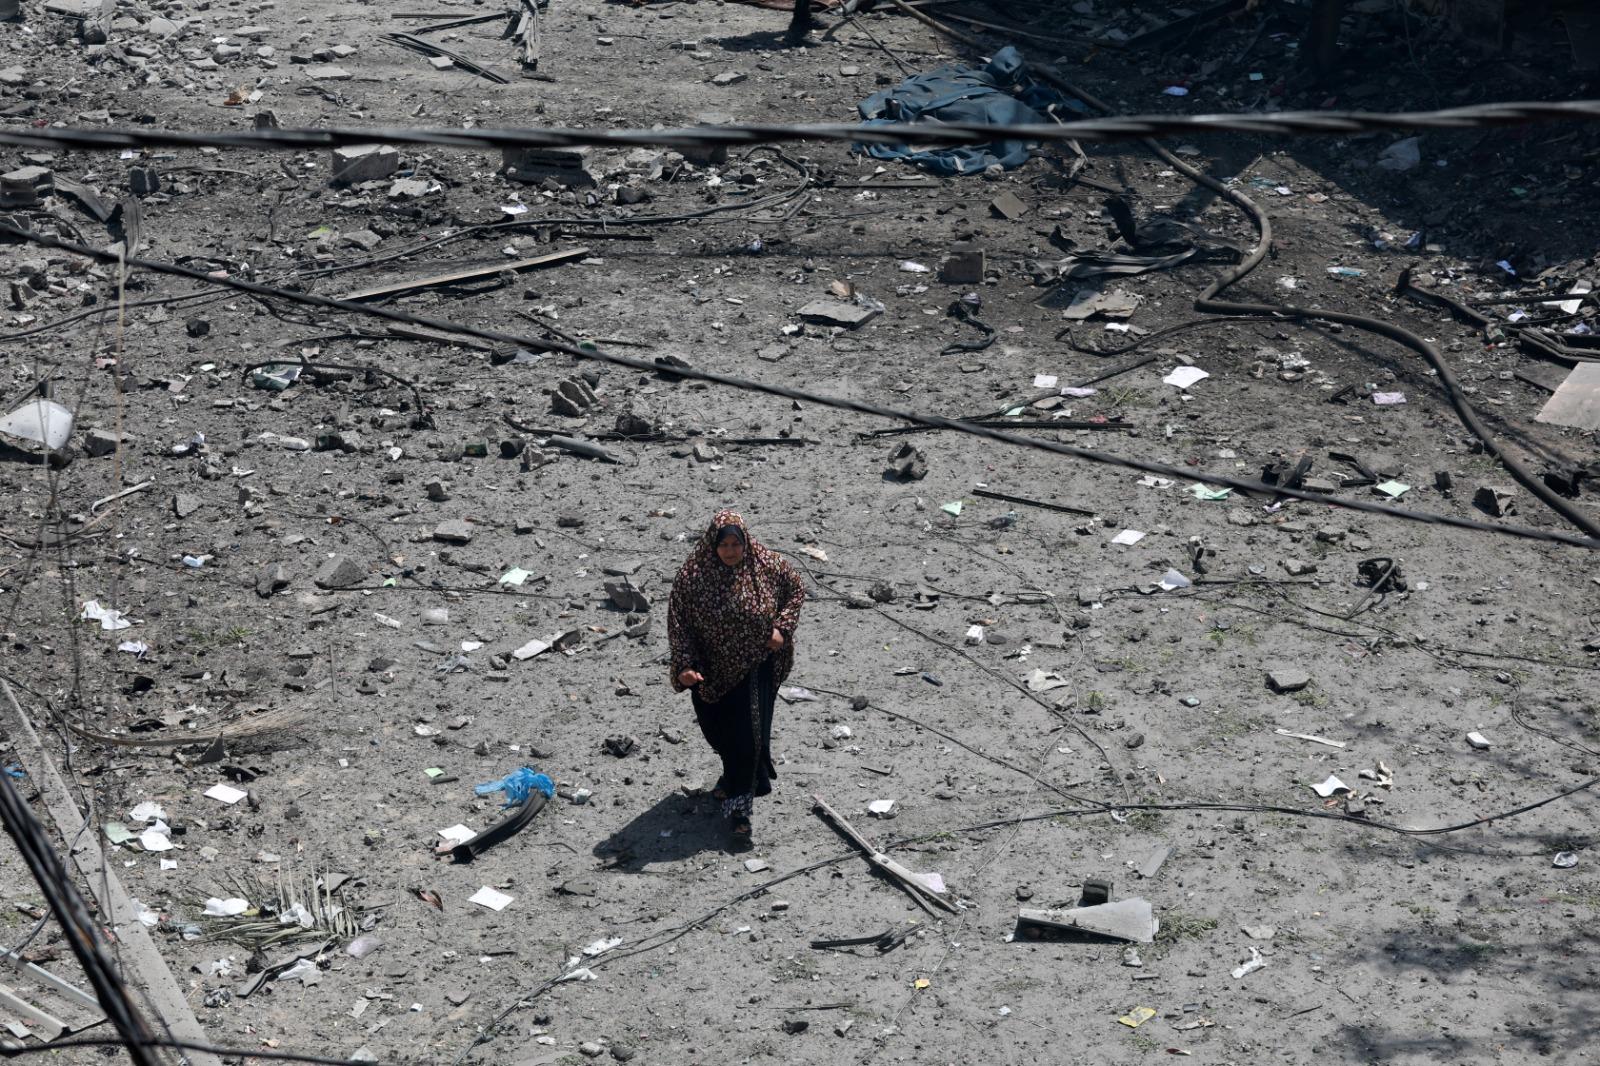 A Palestinian woman walks through the rubble following an Israeli airstrike, May 16, 2021. (Mohammed Zaanoun/Activestills)